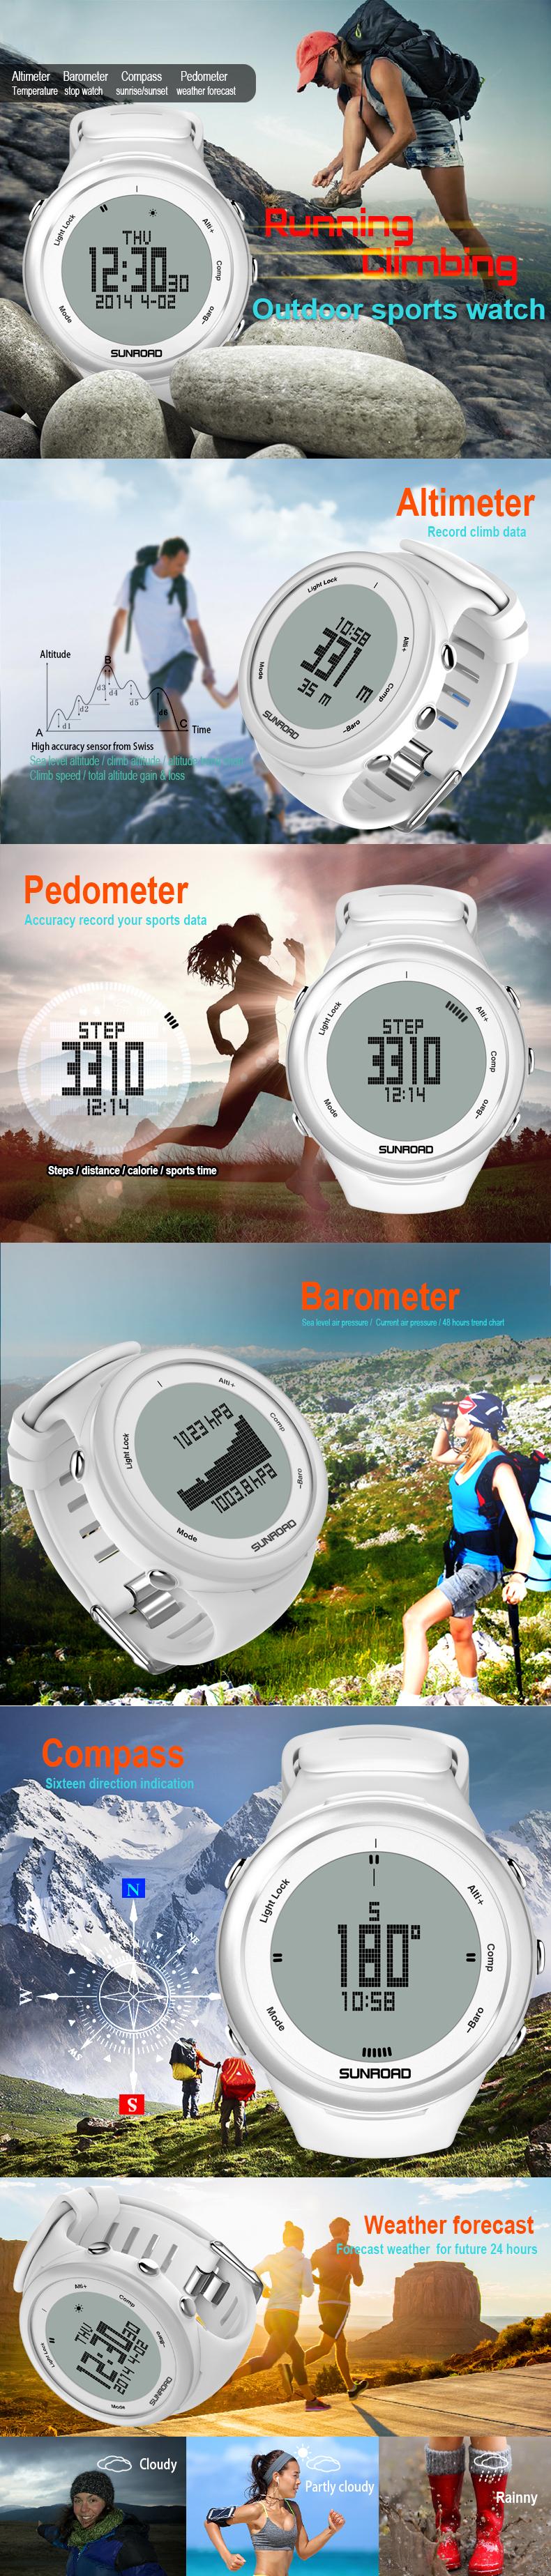 SUNROAD FR852 outdoor sports watch 001